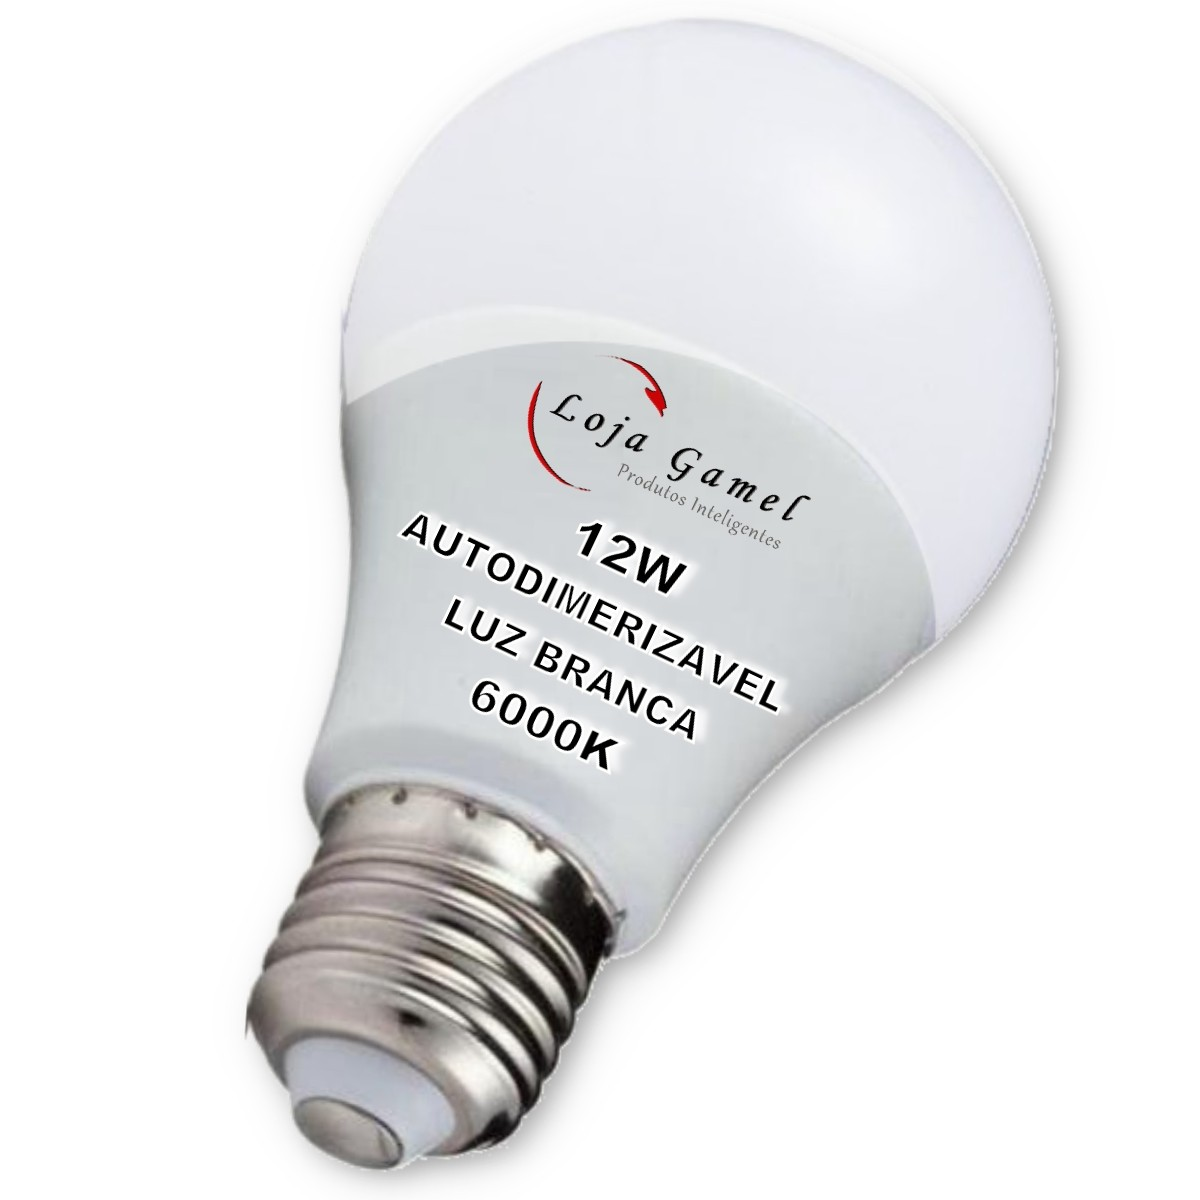 Foto5 - Lâmpada LED Bulbo Autodimerizável 12W Luz Branca 6000K Kit 4un